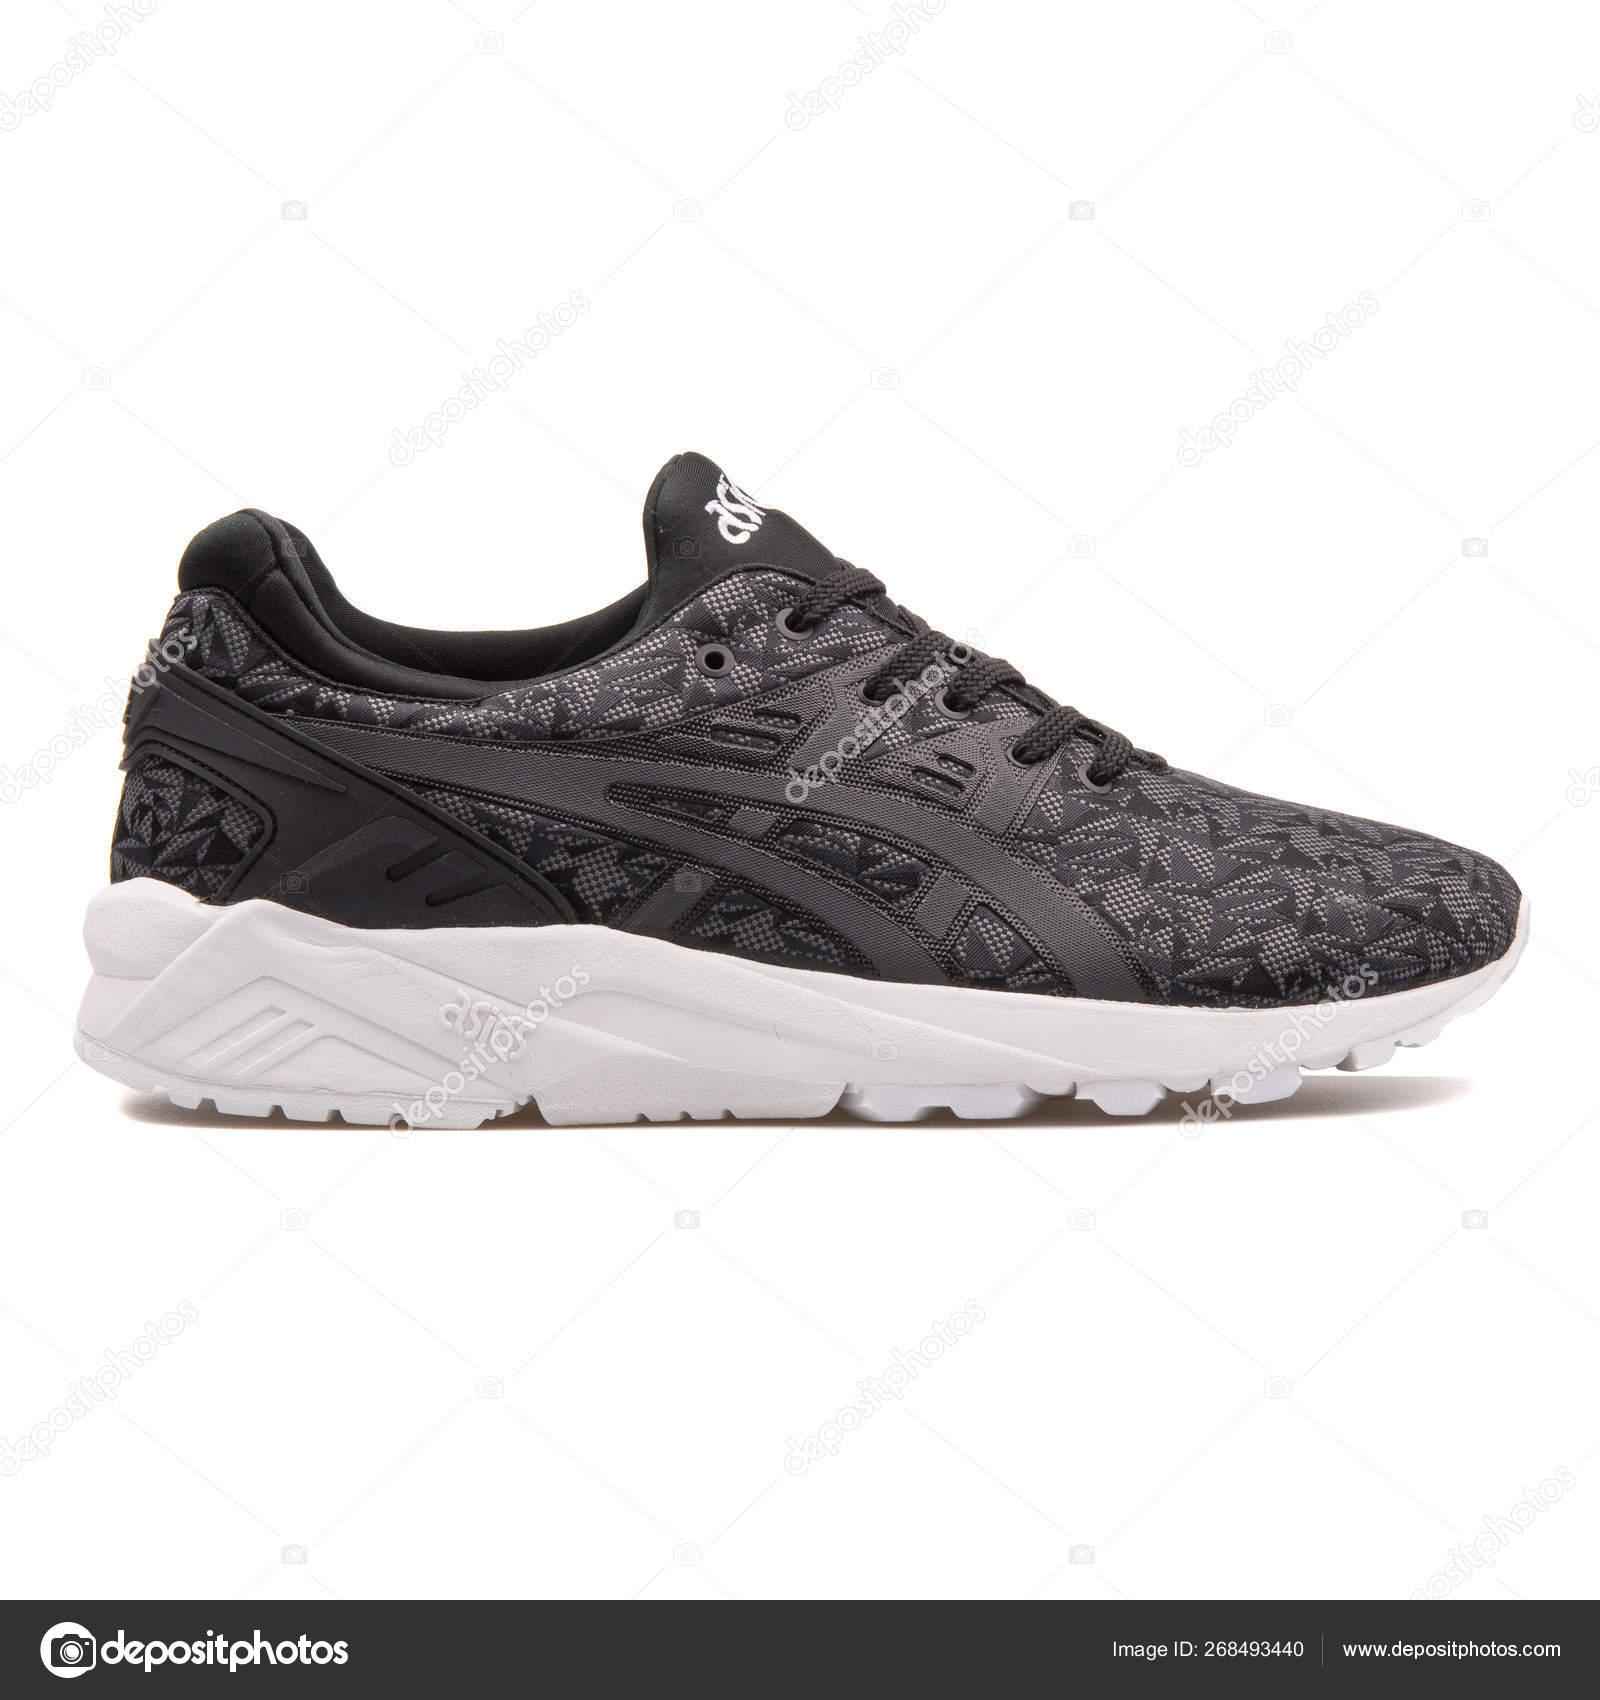 Excelente recomendar prestar  Asics Gel Kayano Trainer Evo black and grey sneaker – Stock Editorial Photo  © xMarshallfilms #268493440